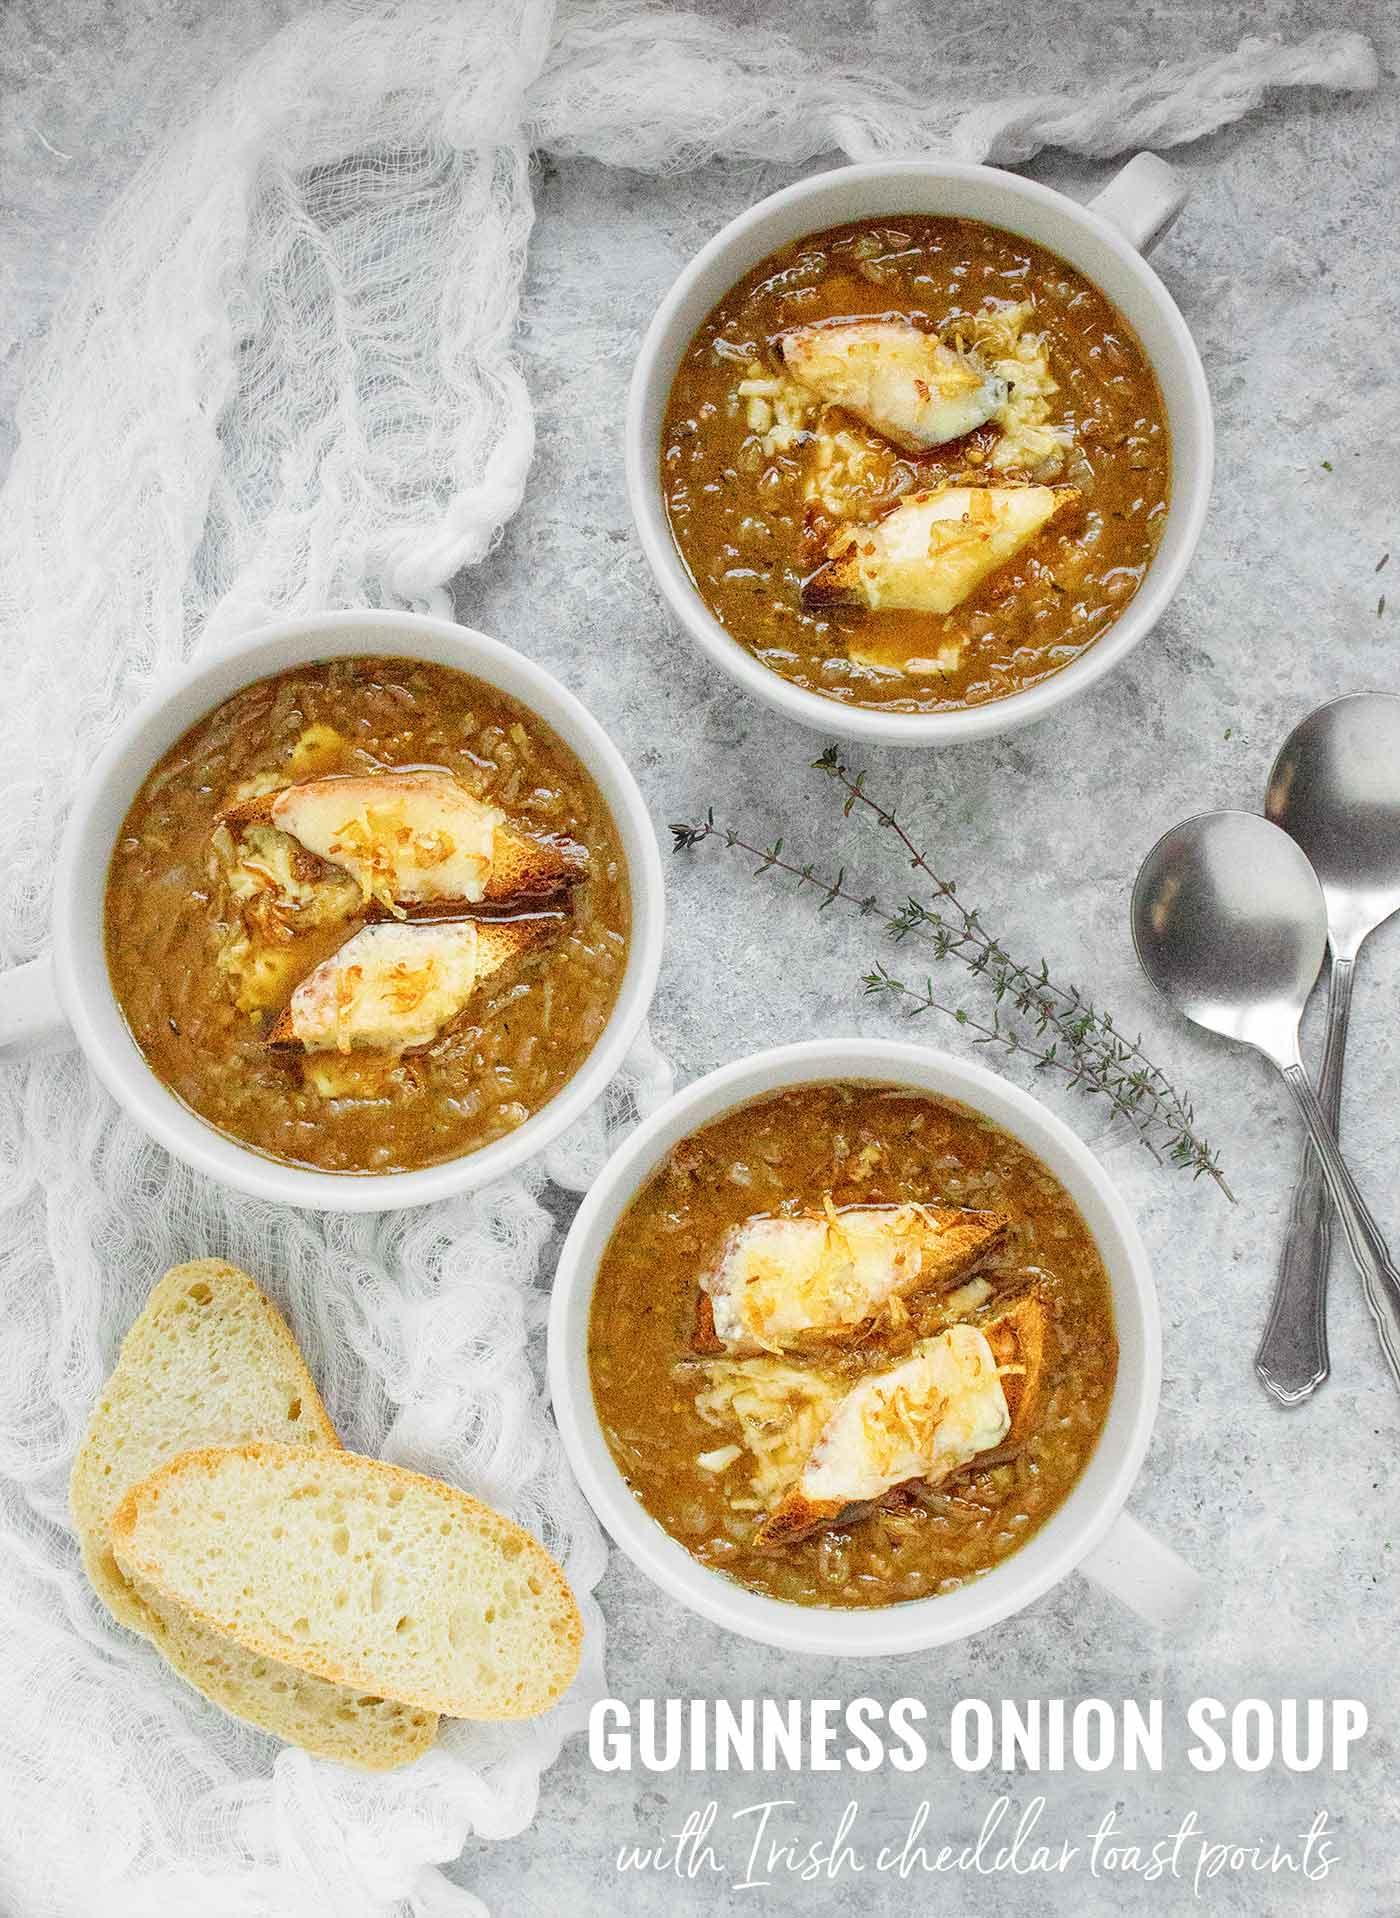 Guinness Onion Soup - Recipe at SoupAddict.com